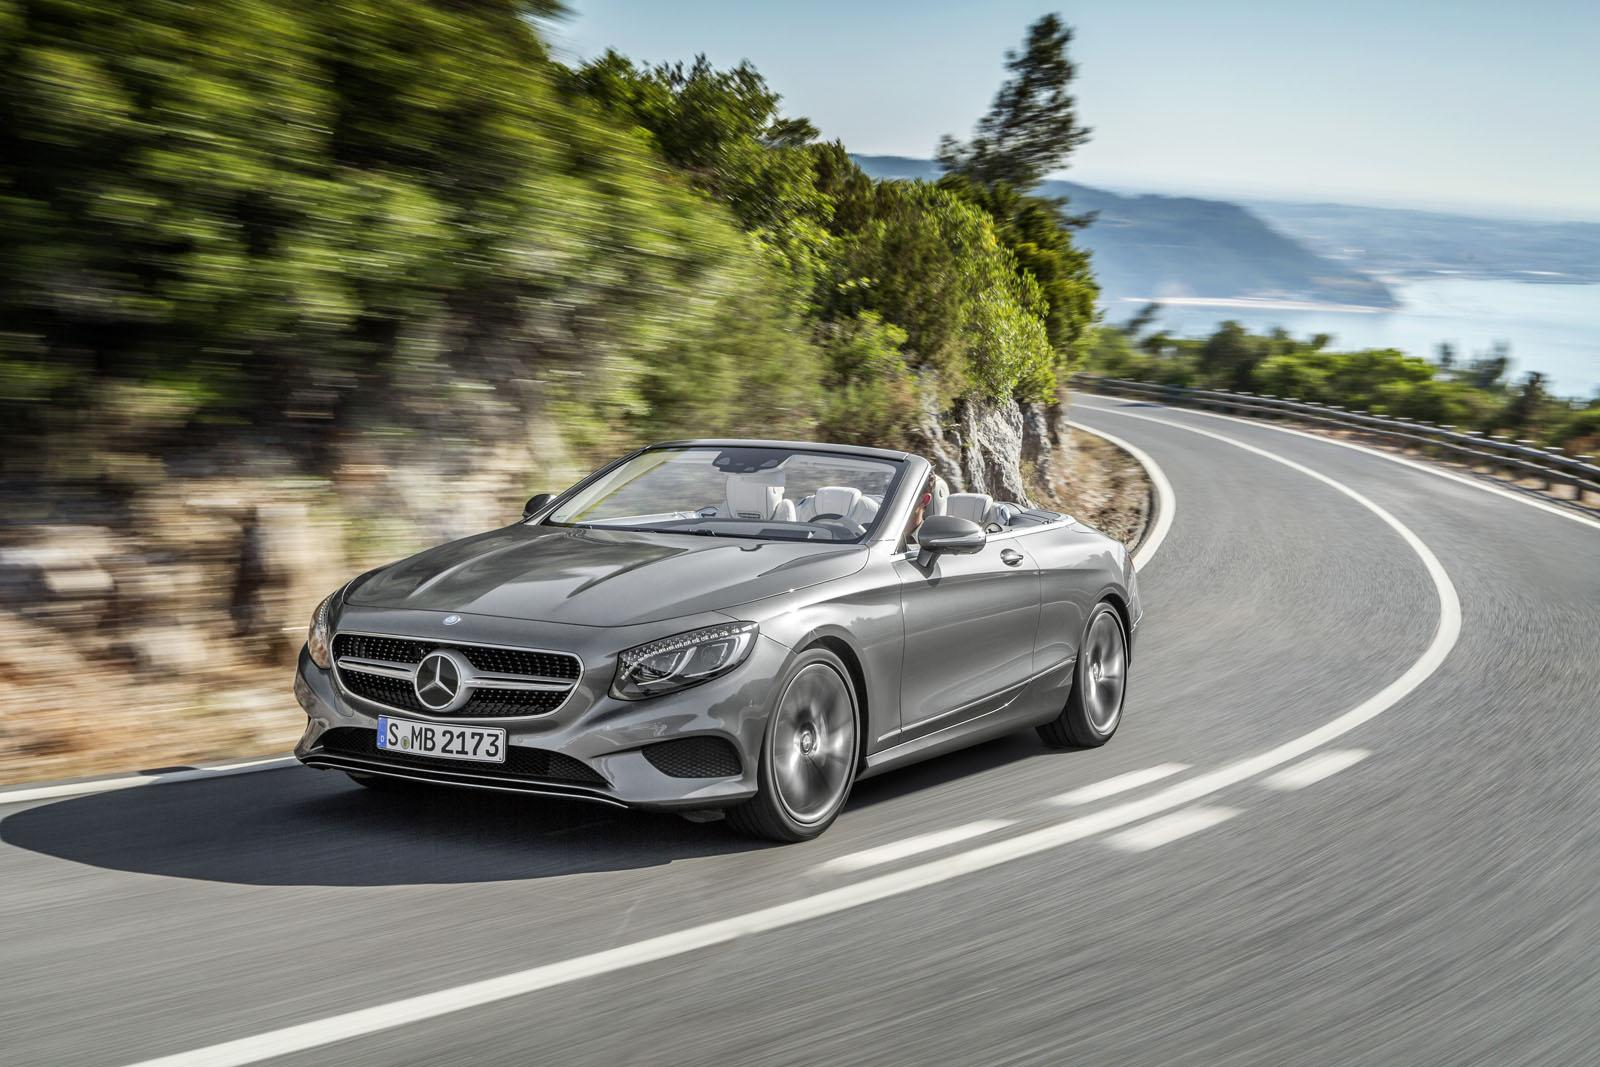 Mercedes-Benz-Classe-S-Cabriolet-2